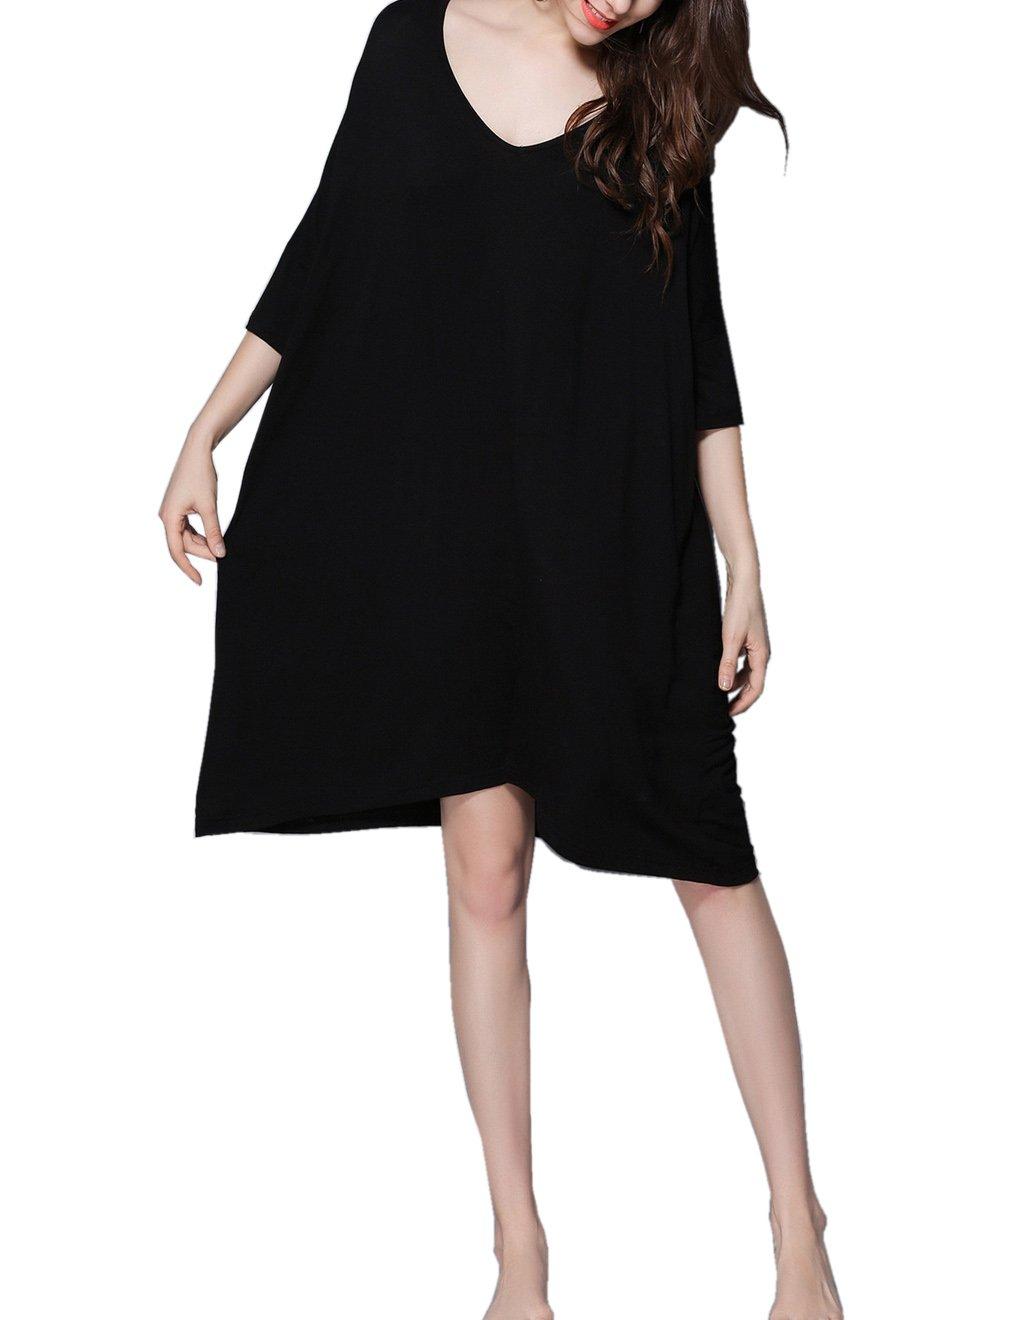 HONG HUI Women's Nightgown Modal V Neck Nightwear Loose 3/4 Sleeve Sleepwear,Black,Large